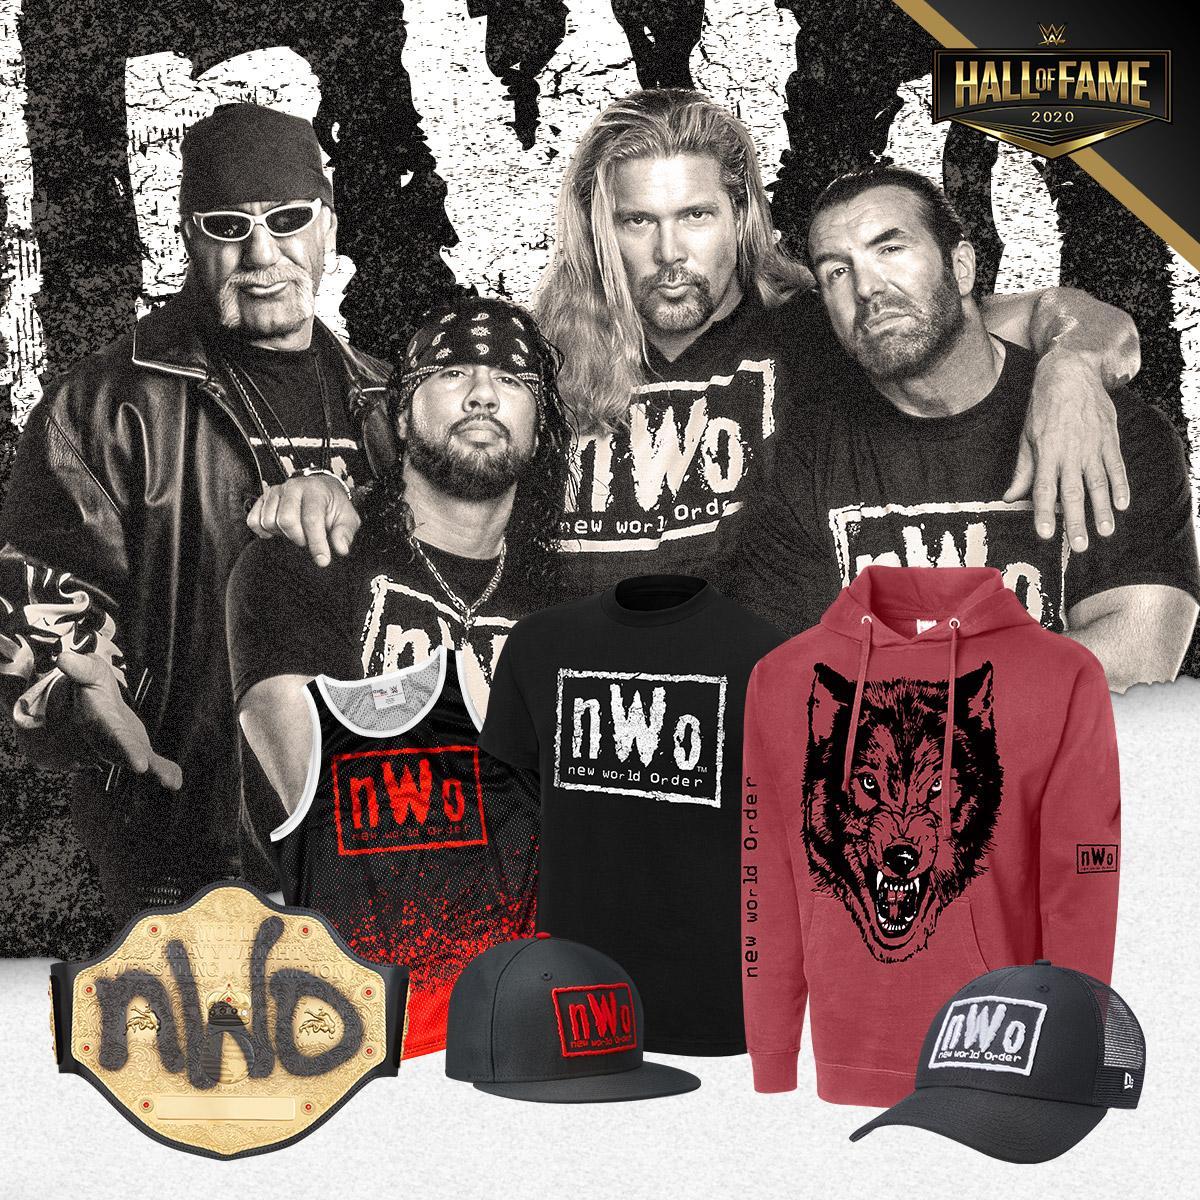 HoF 4 Life! Celebrate with #nWo gear at #WWEShop. #WWE